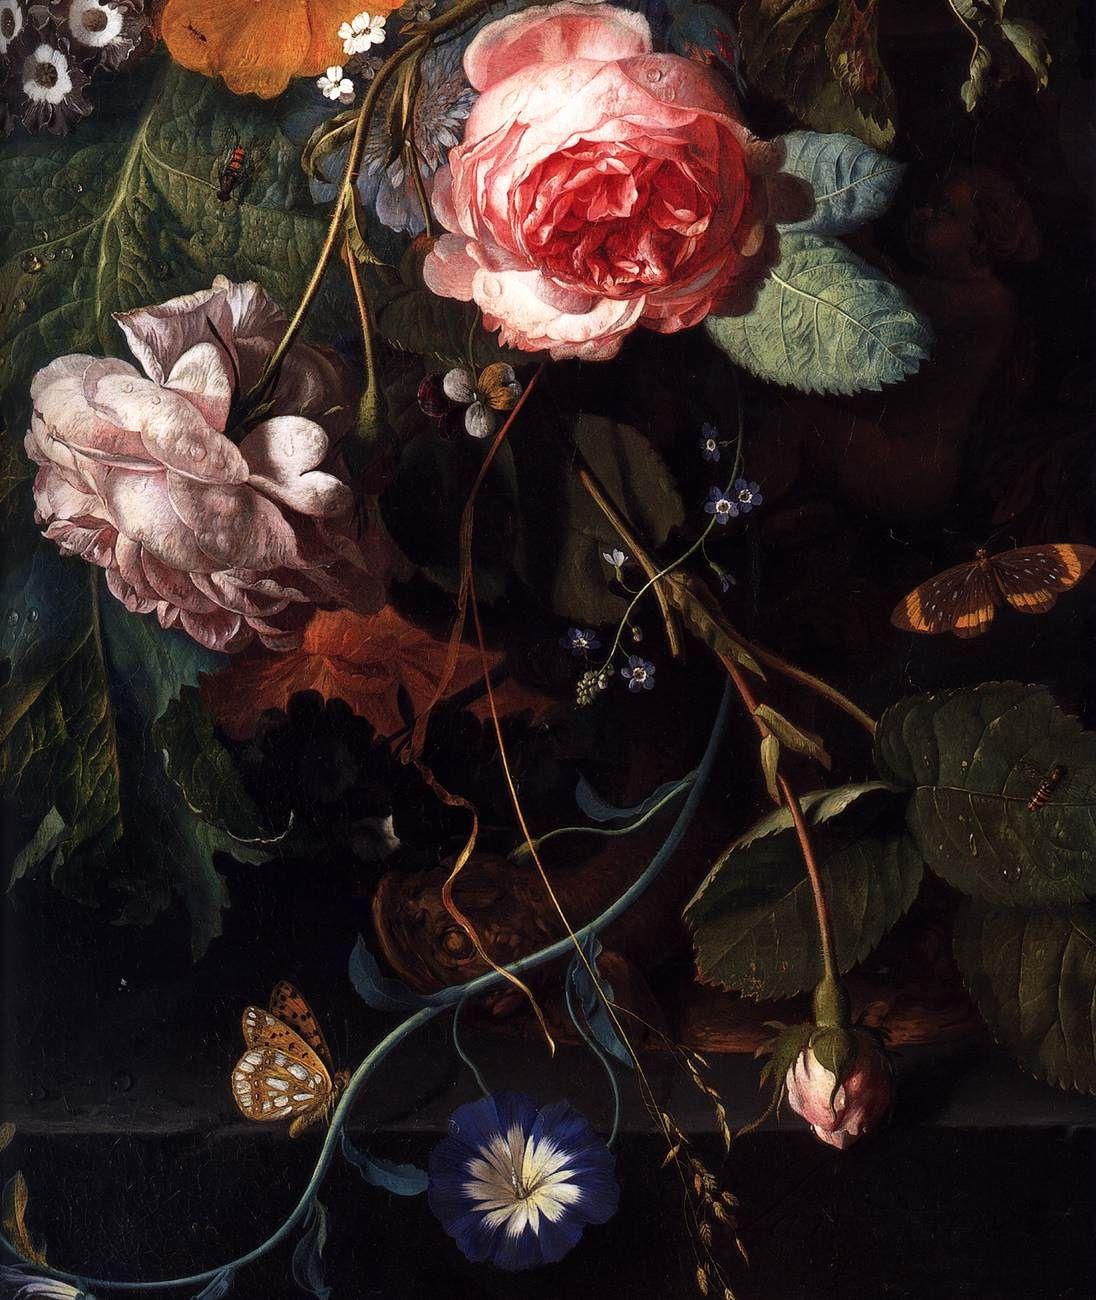 Jan-Van-Huysum-14.jpg (1096×1300)